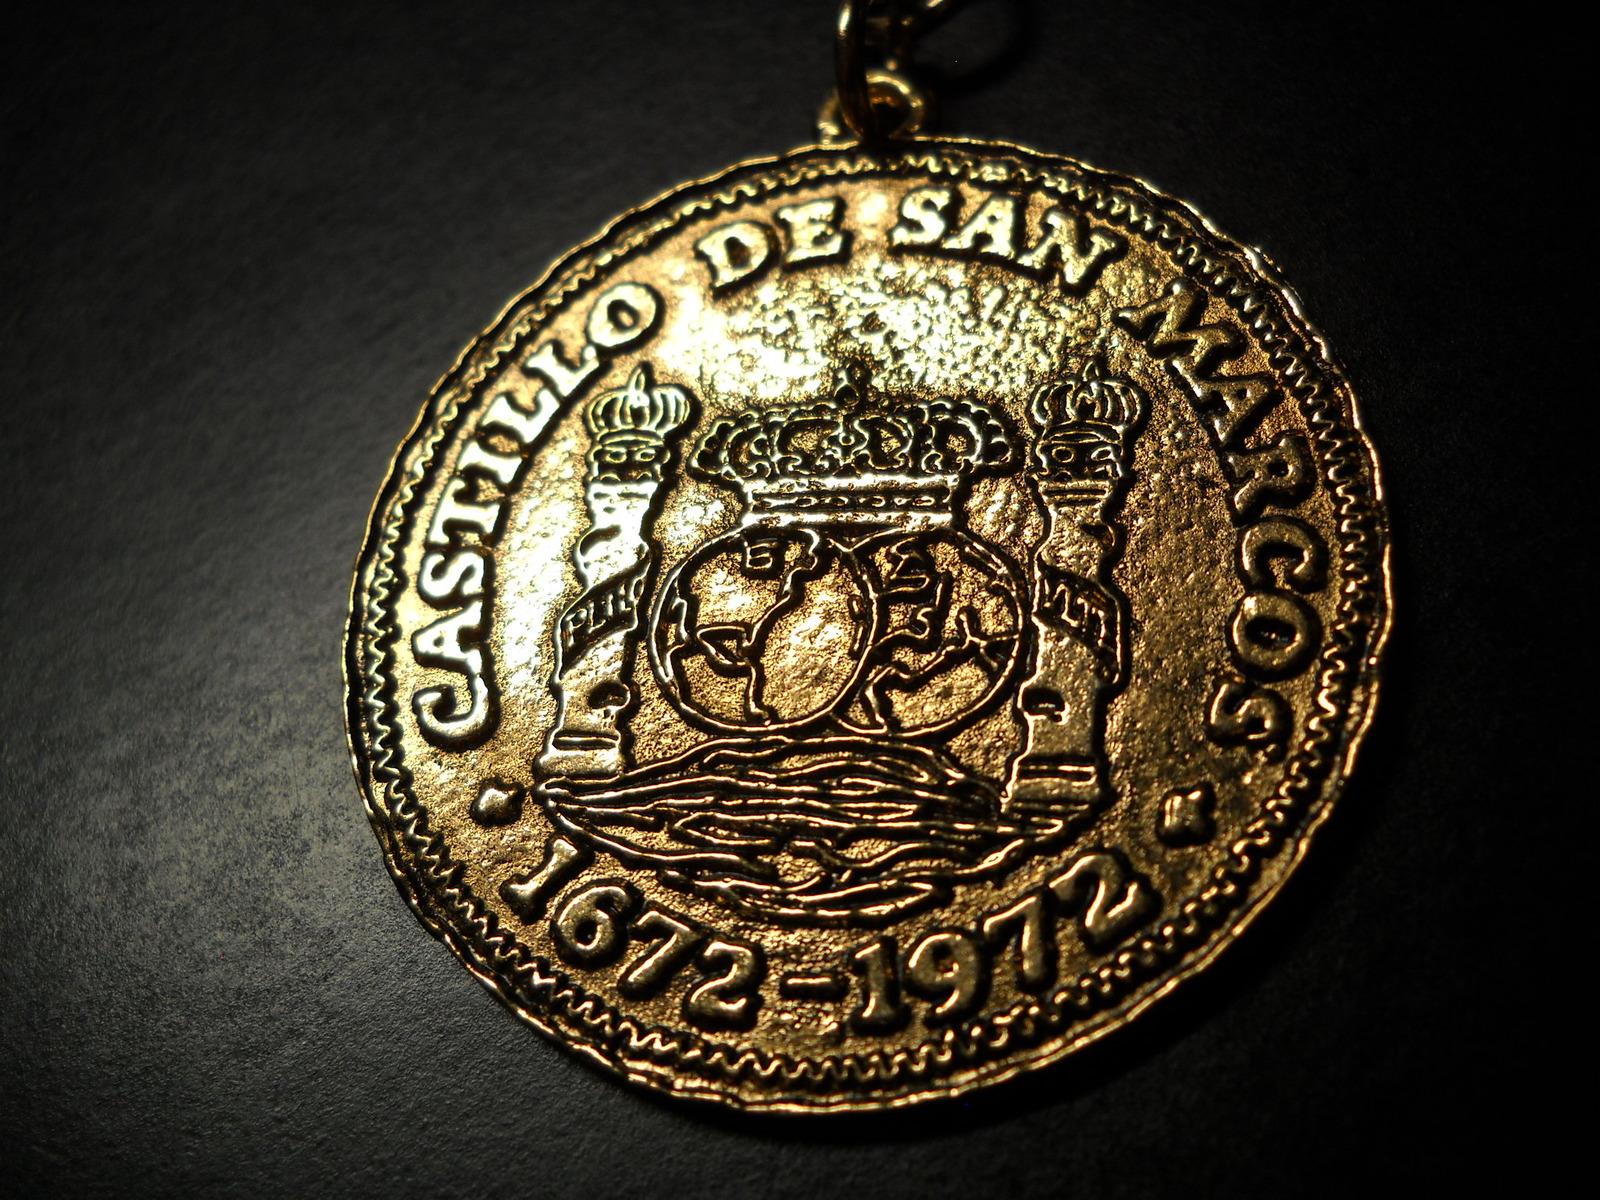 Castillo De San Marco Key Chain Bright Gold and 50 similar items